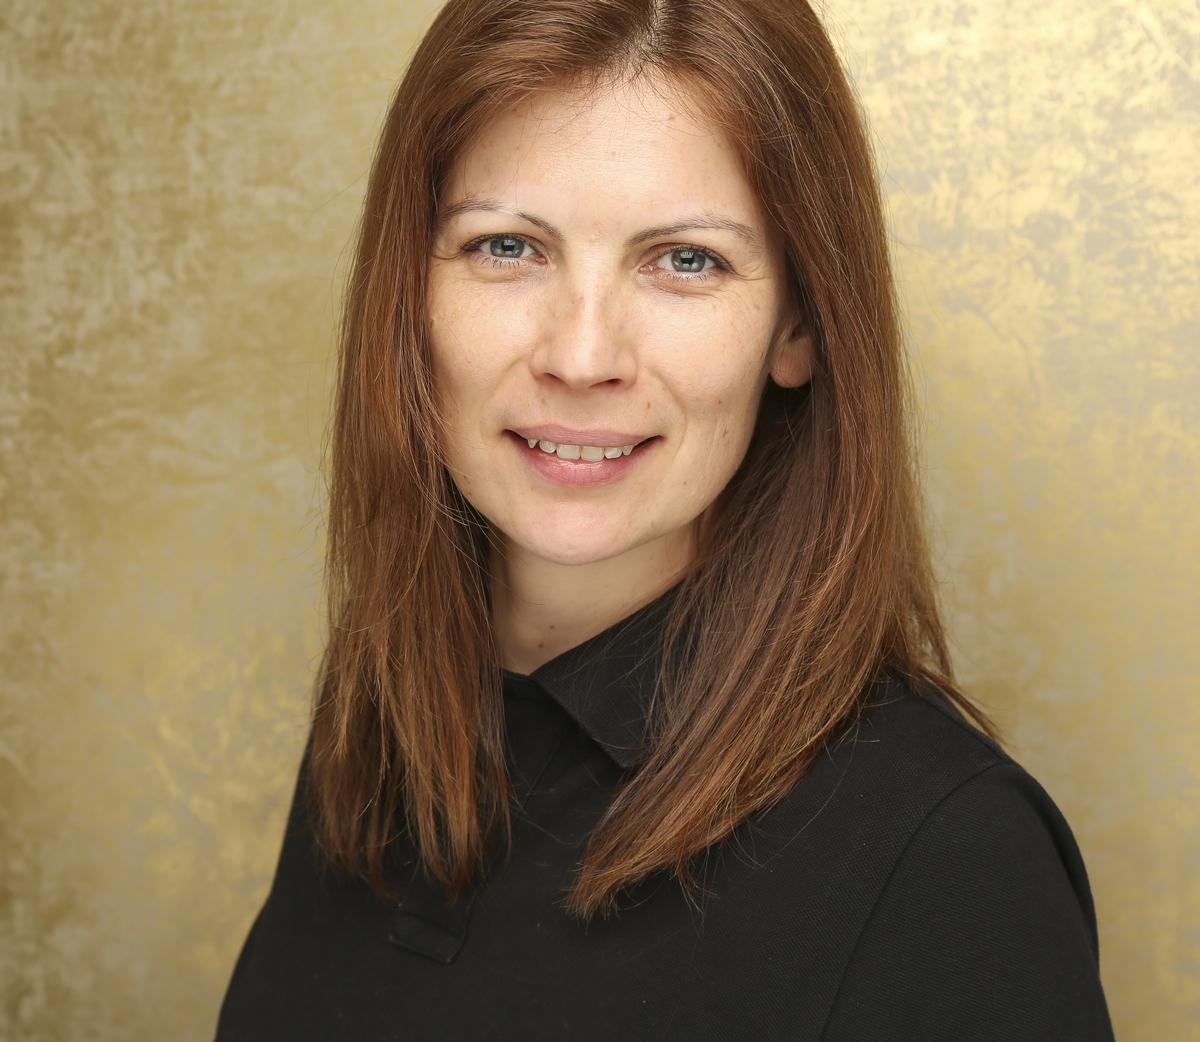 Rosemarie Dieter, Malermeister